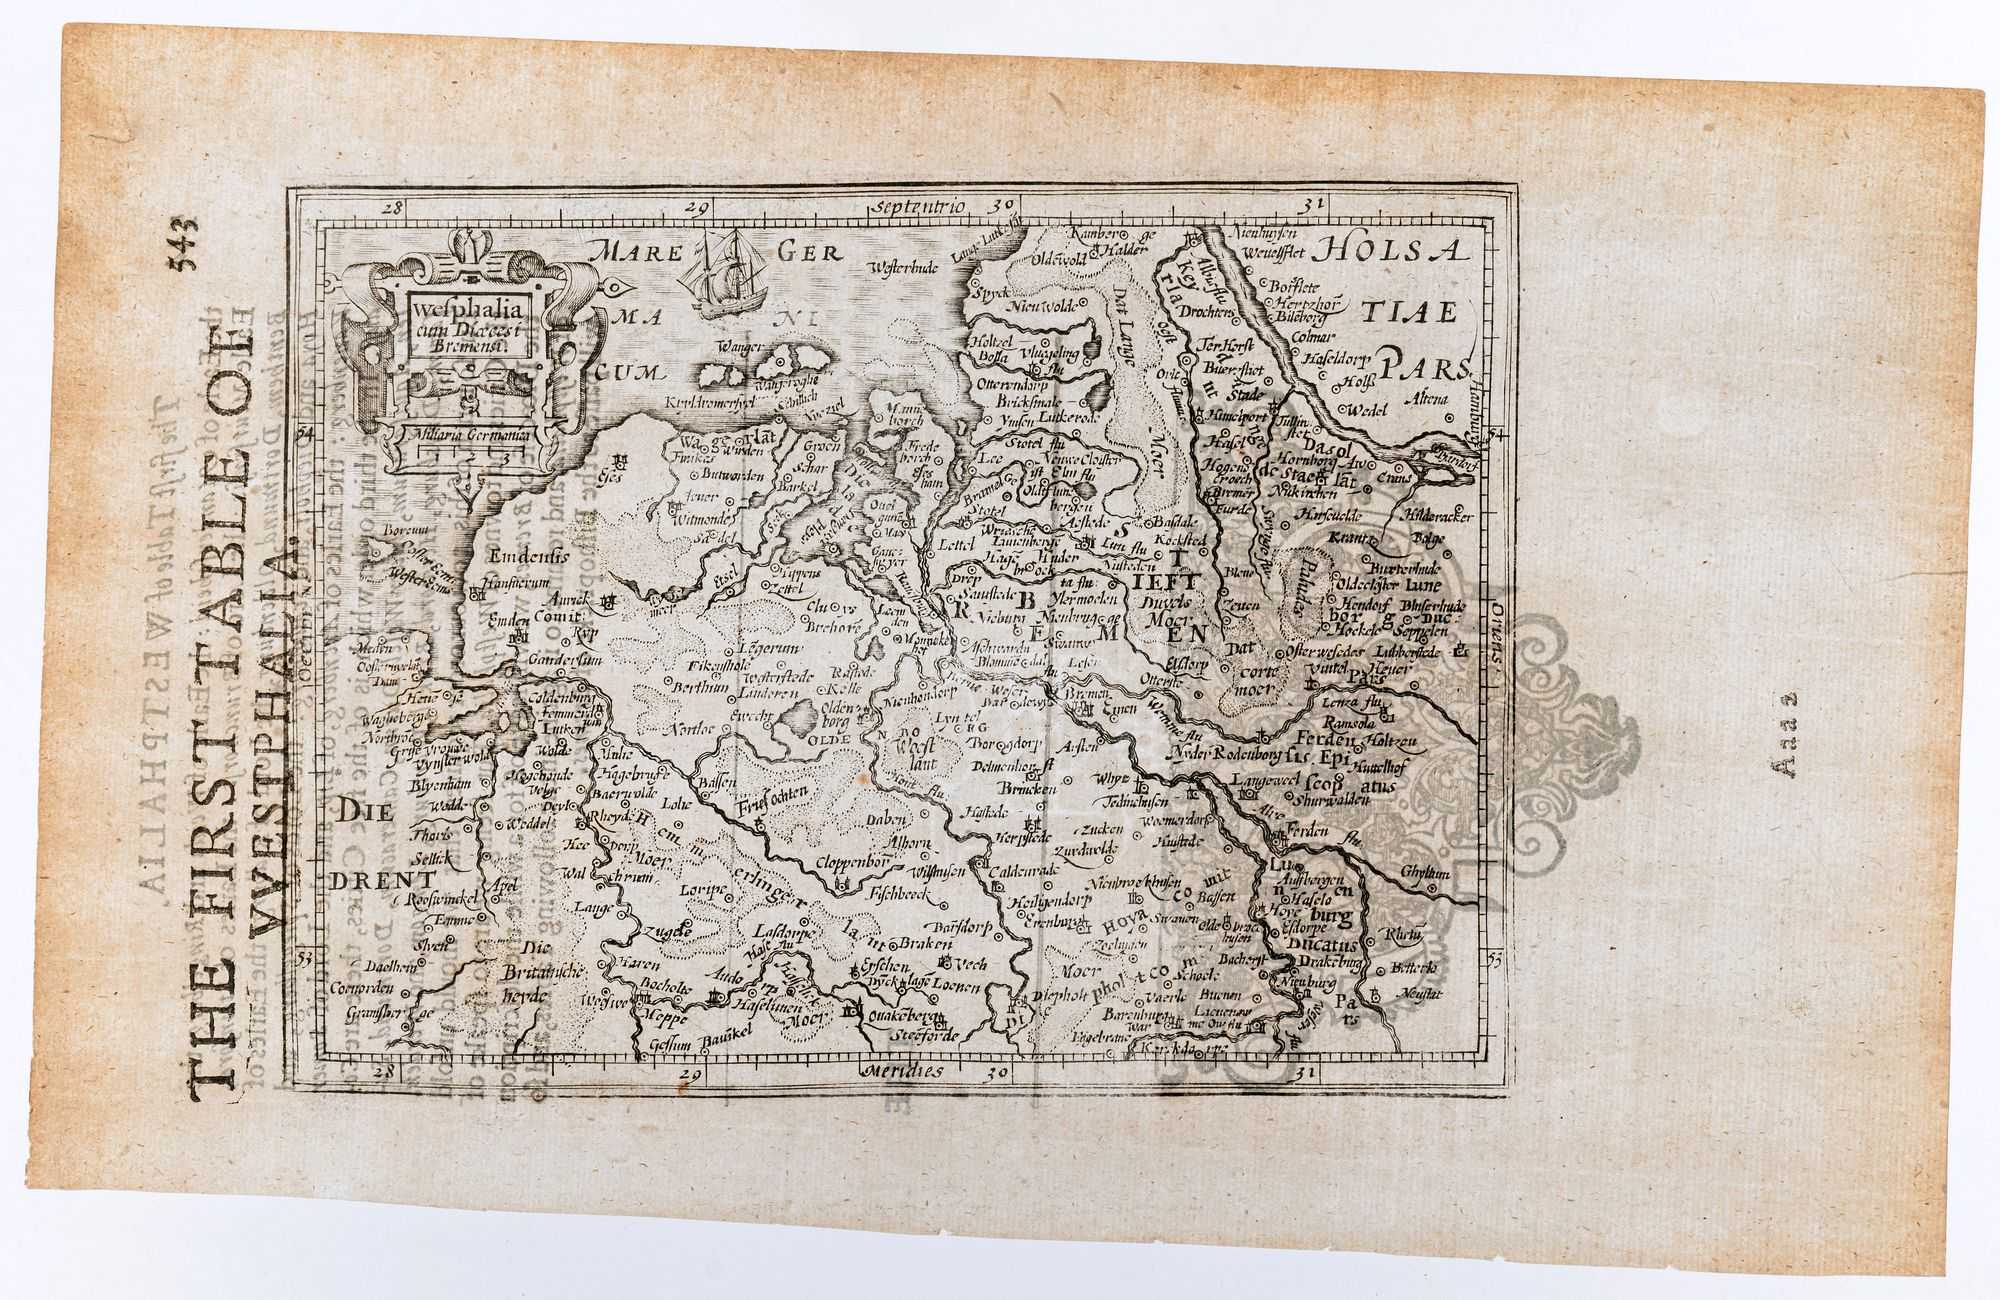 MERCATOR, Gerard & HONDIUS, Jodocus. -  Wesphalia cum Dioecesi Bremensi. / The First Table of Westphalia. [Germany]